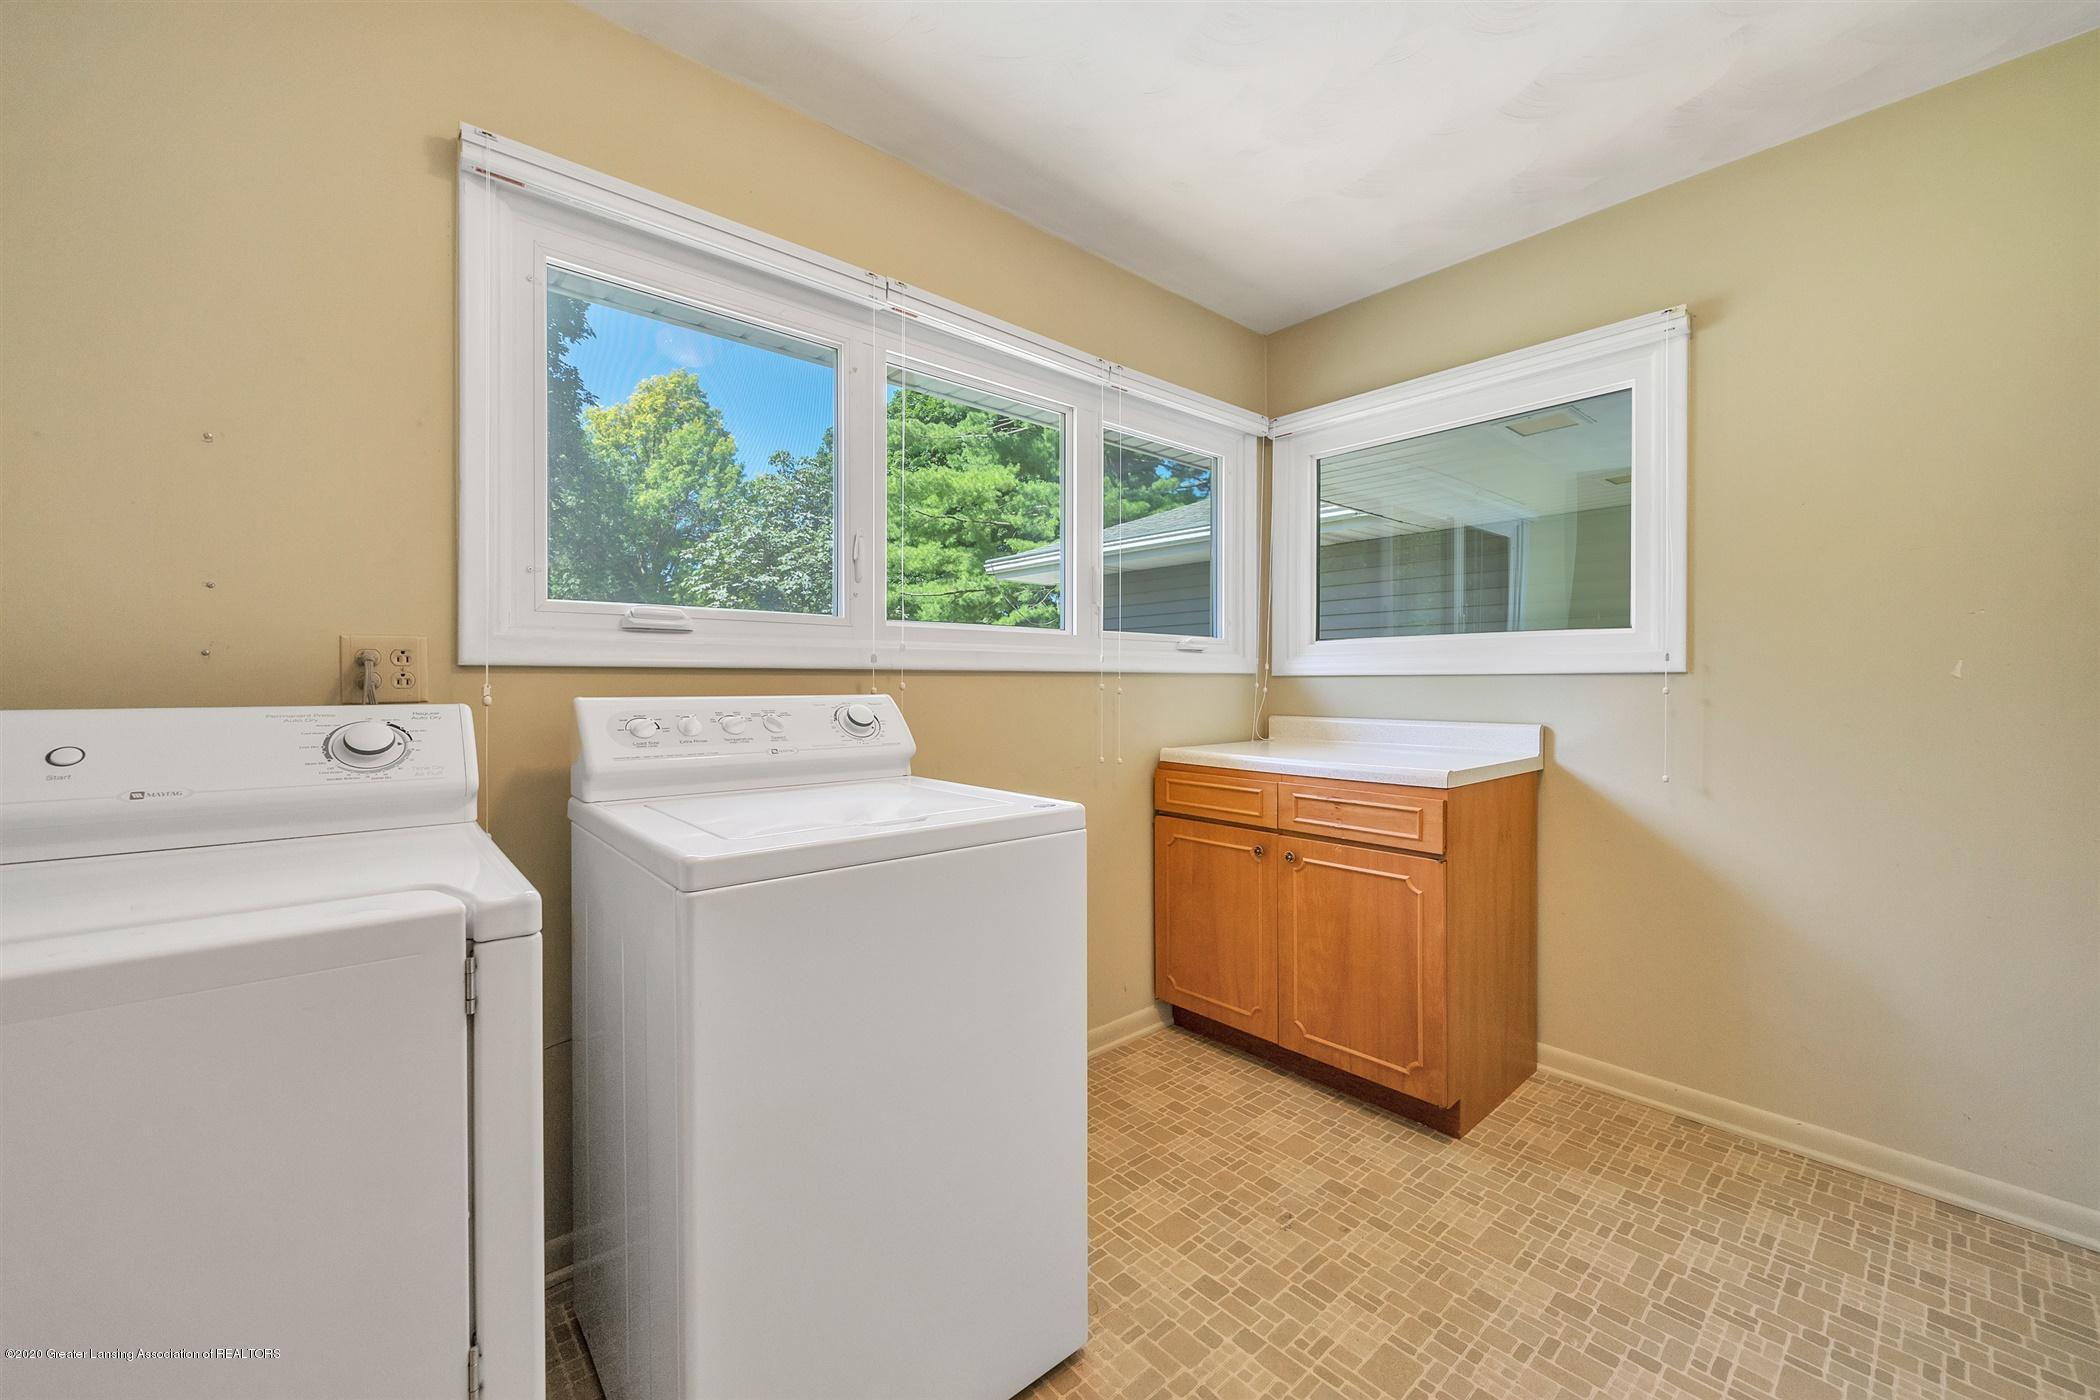 2150 Arundel Pl - (22.1) MAIN FLOOR Laundry Room - 24